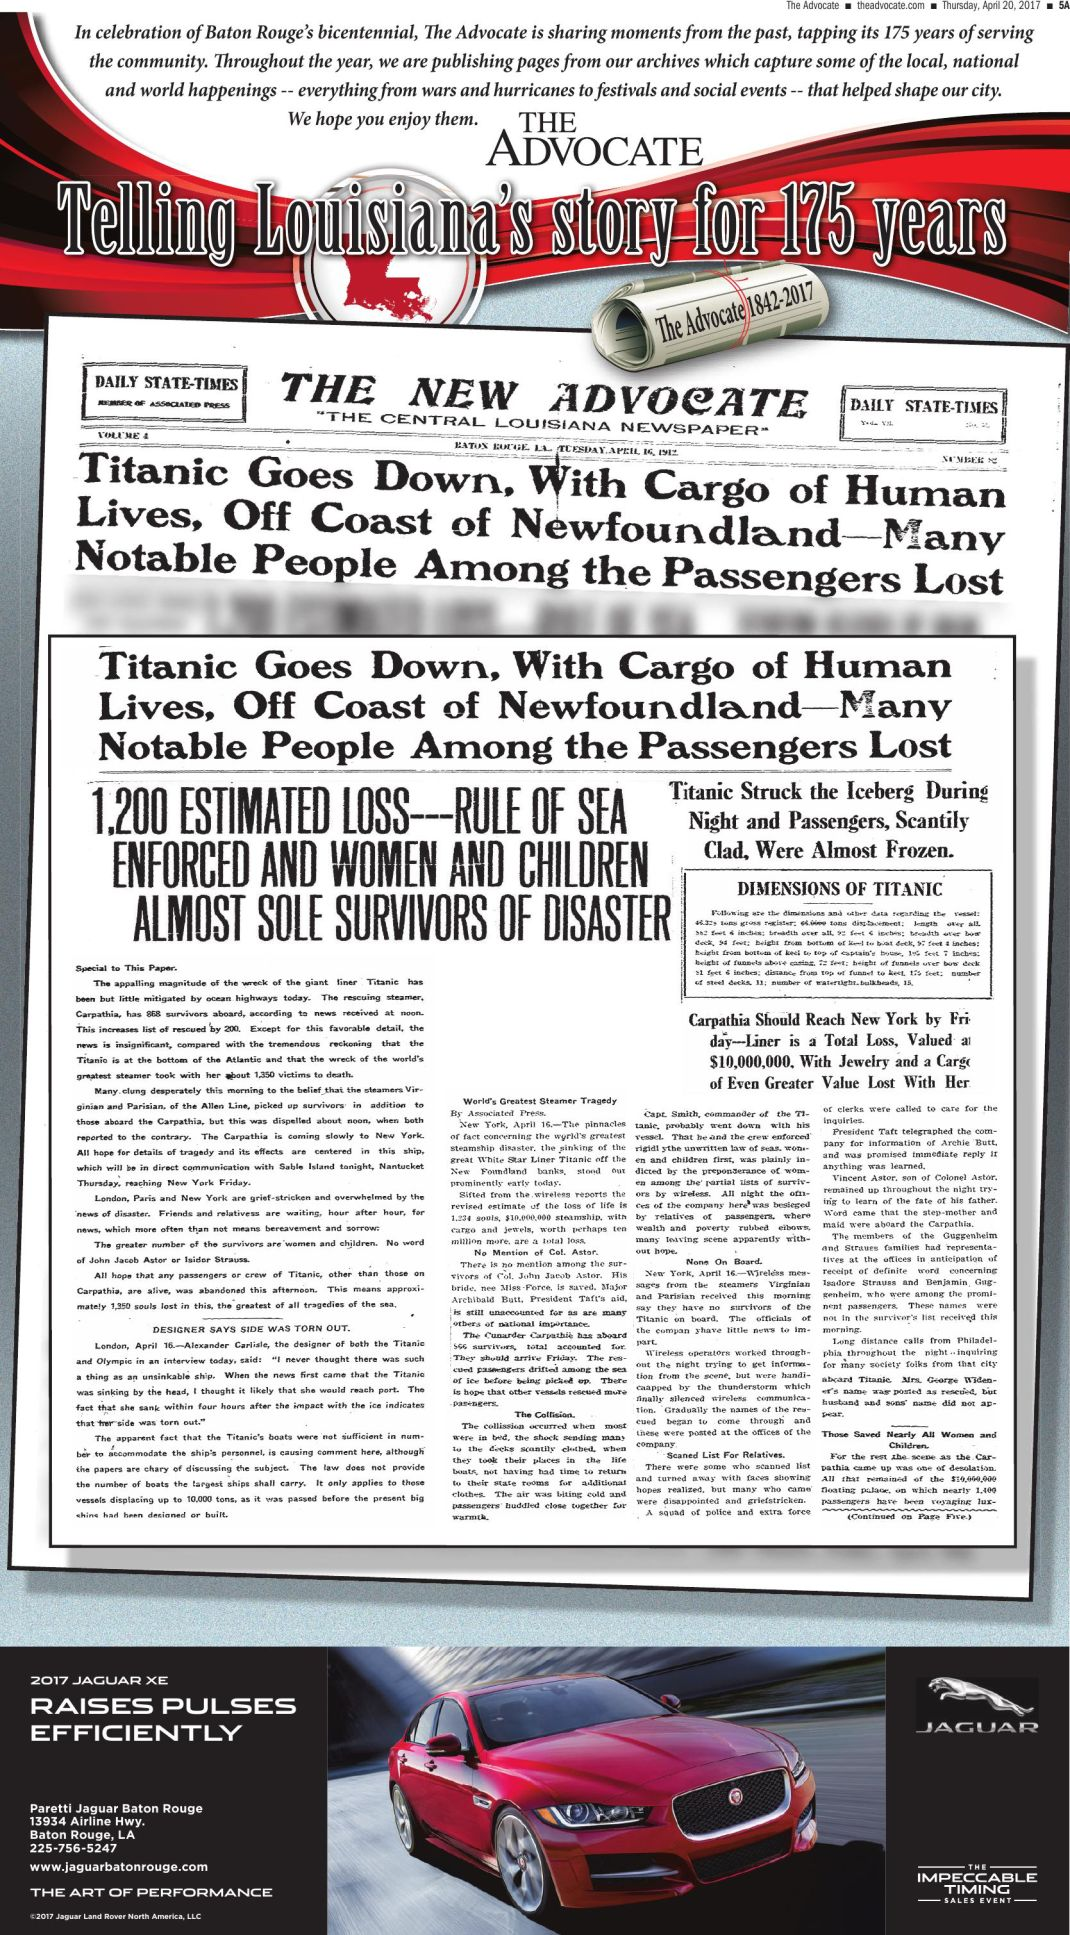 Titanic goes down